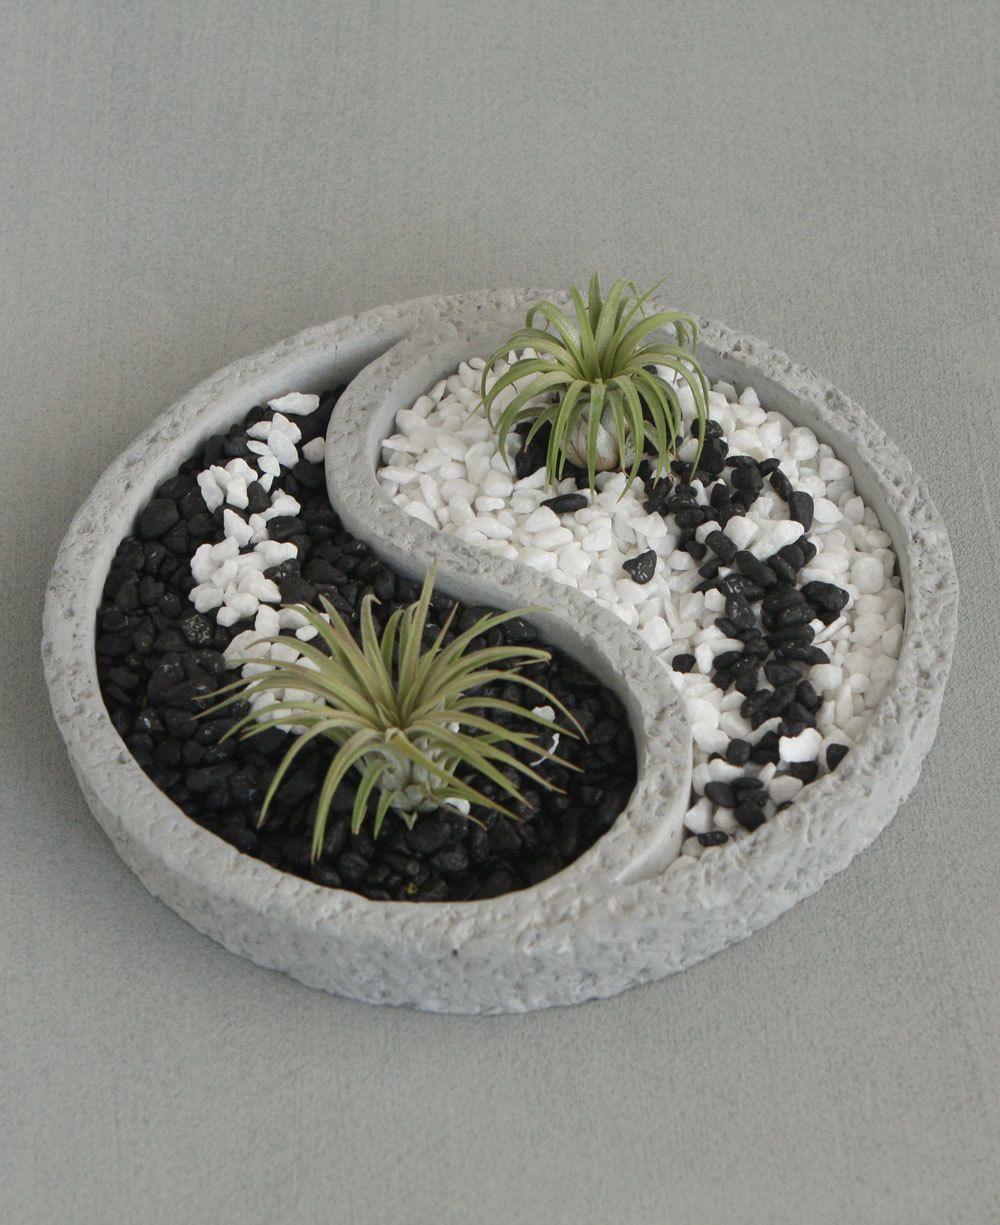 Plantes Pour Jardin Contemporain relaxing yin yang inspired zen terrarium comes with colorful